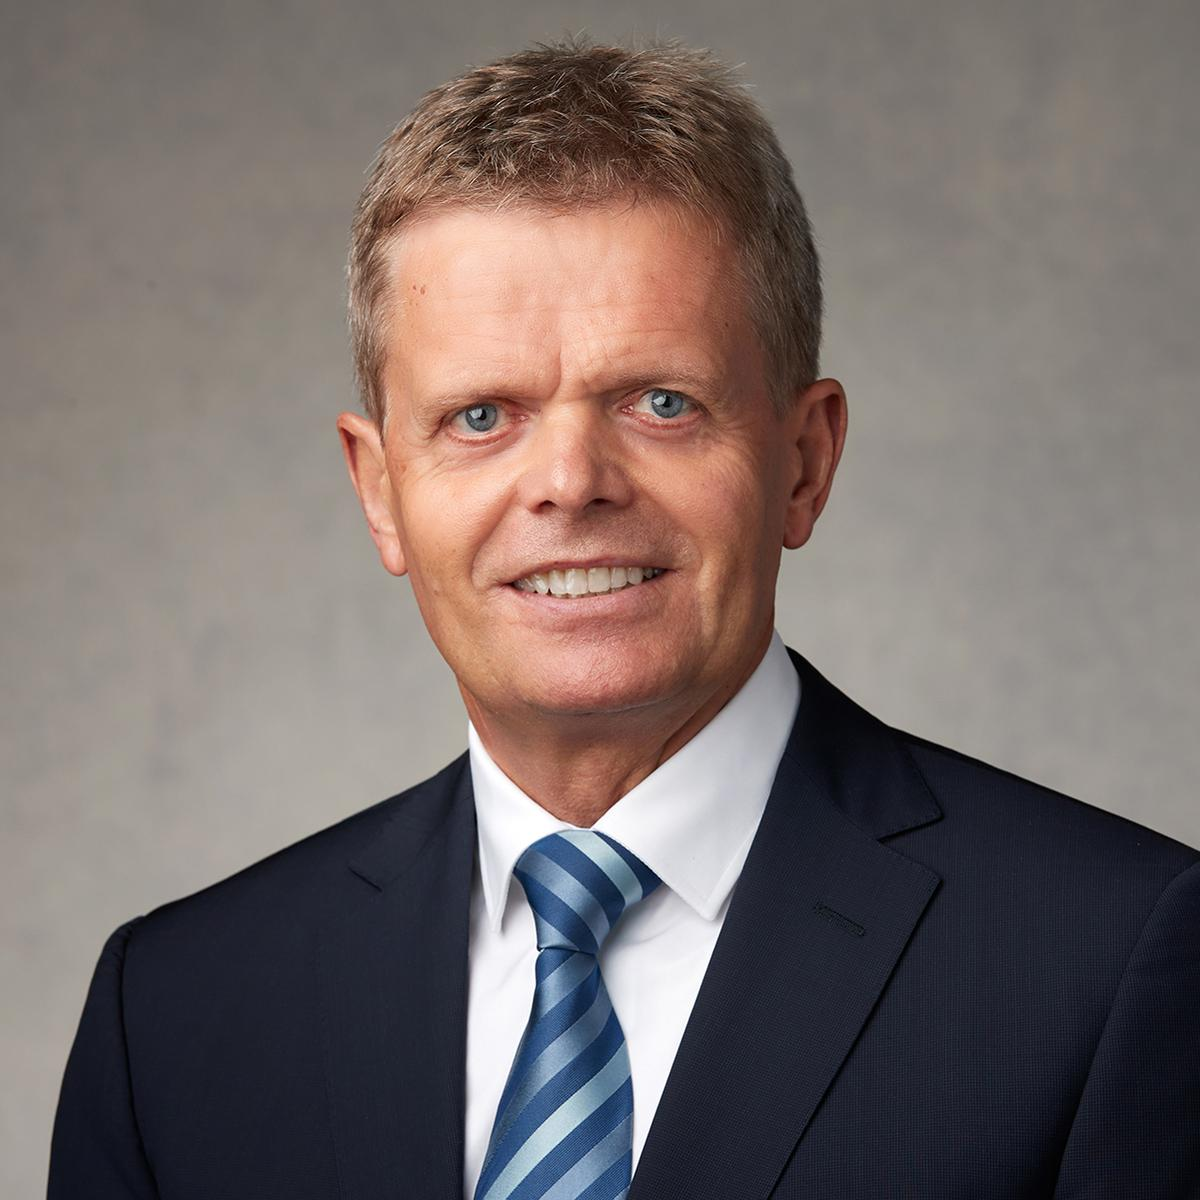 Elder Torben Engbjerg, Dänemark Gebietssiebziger